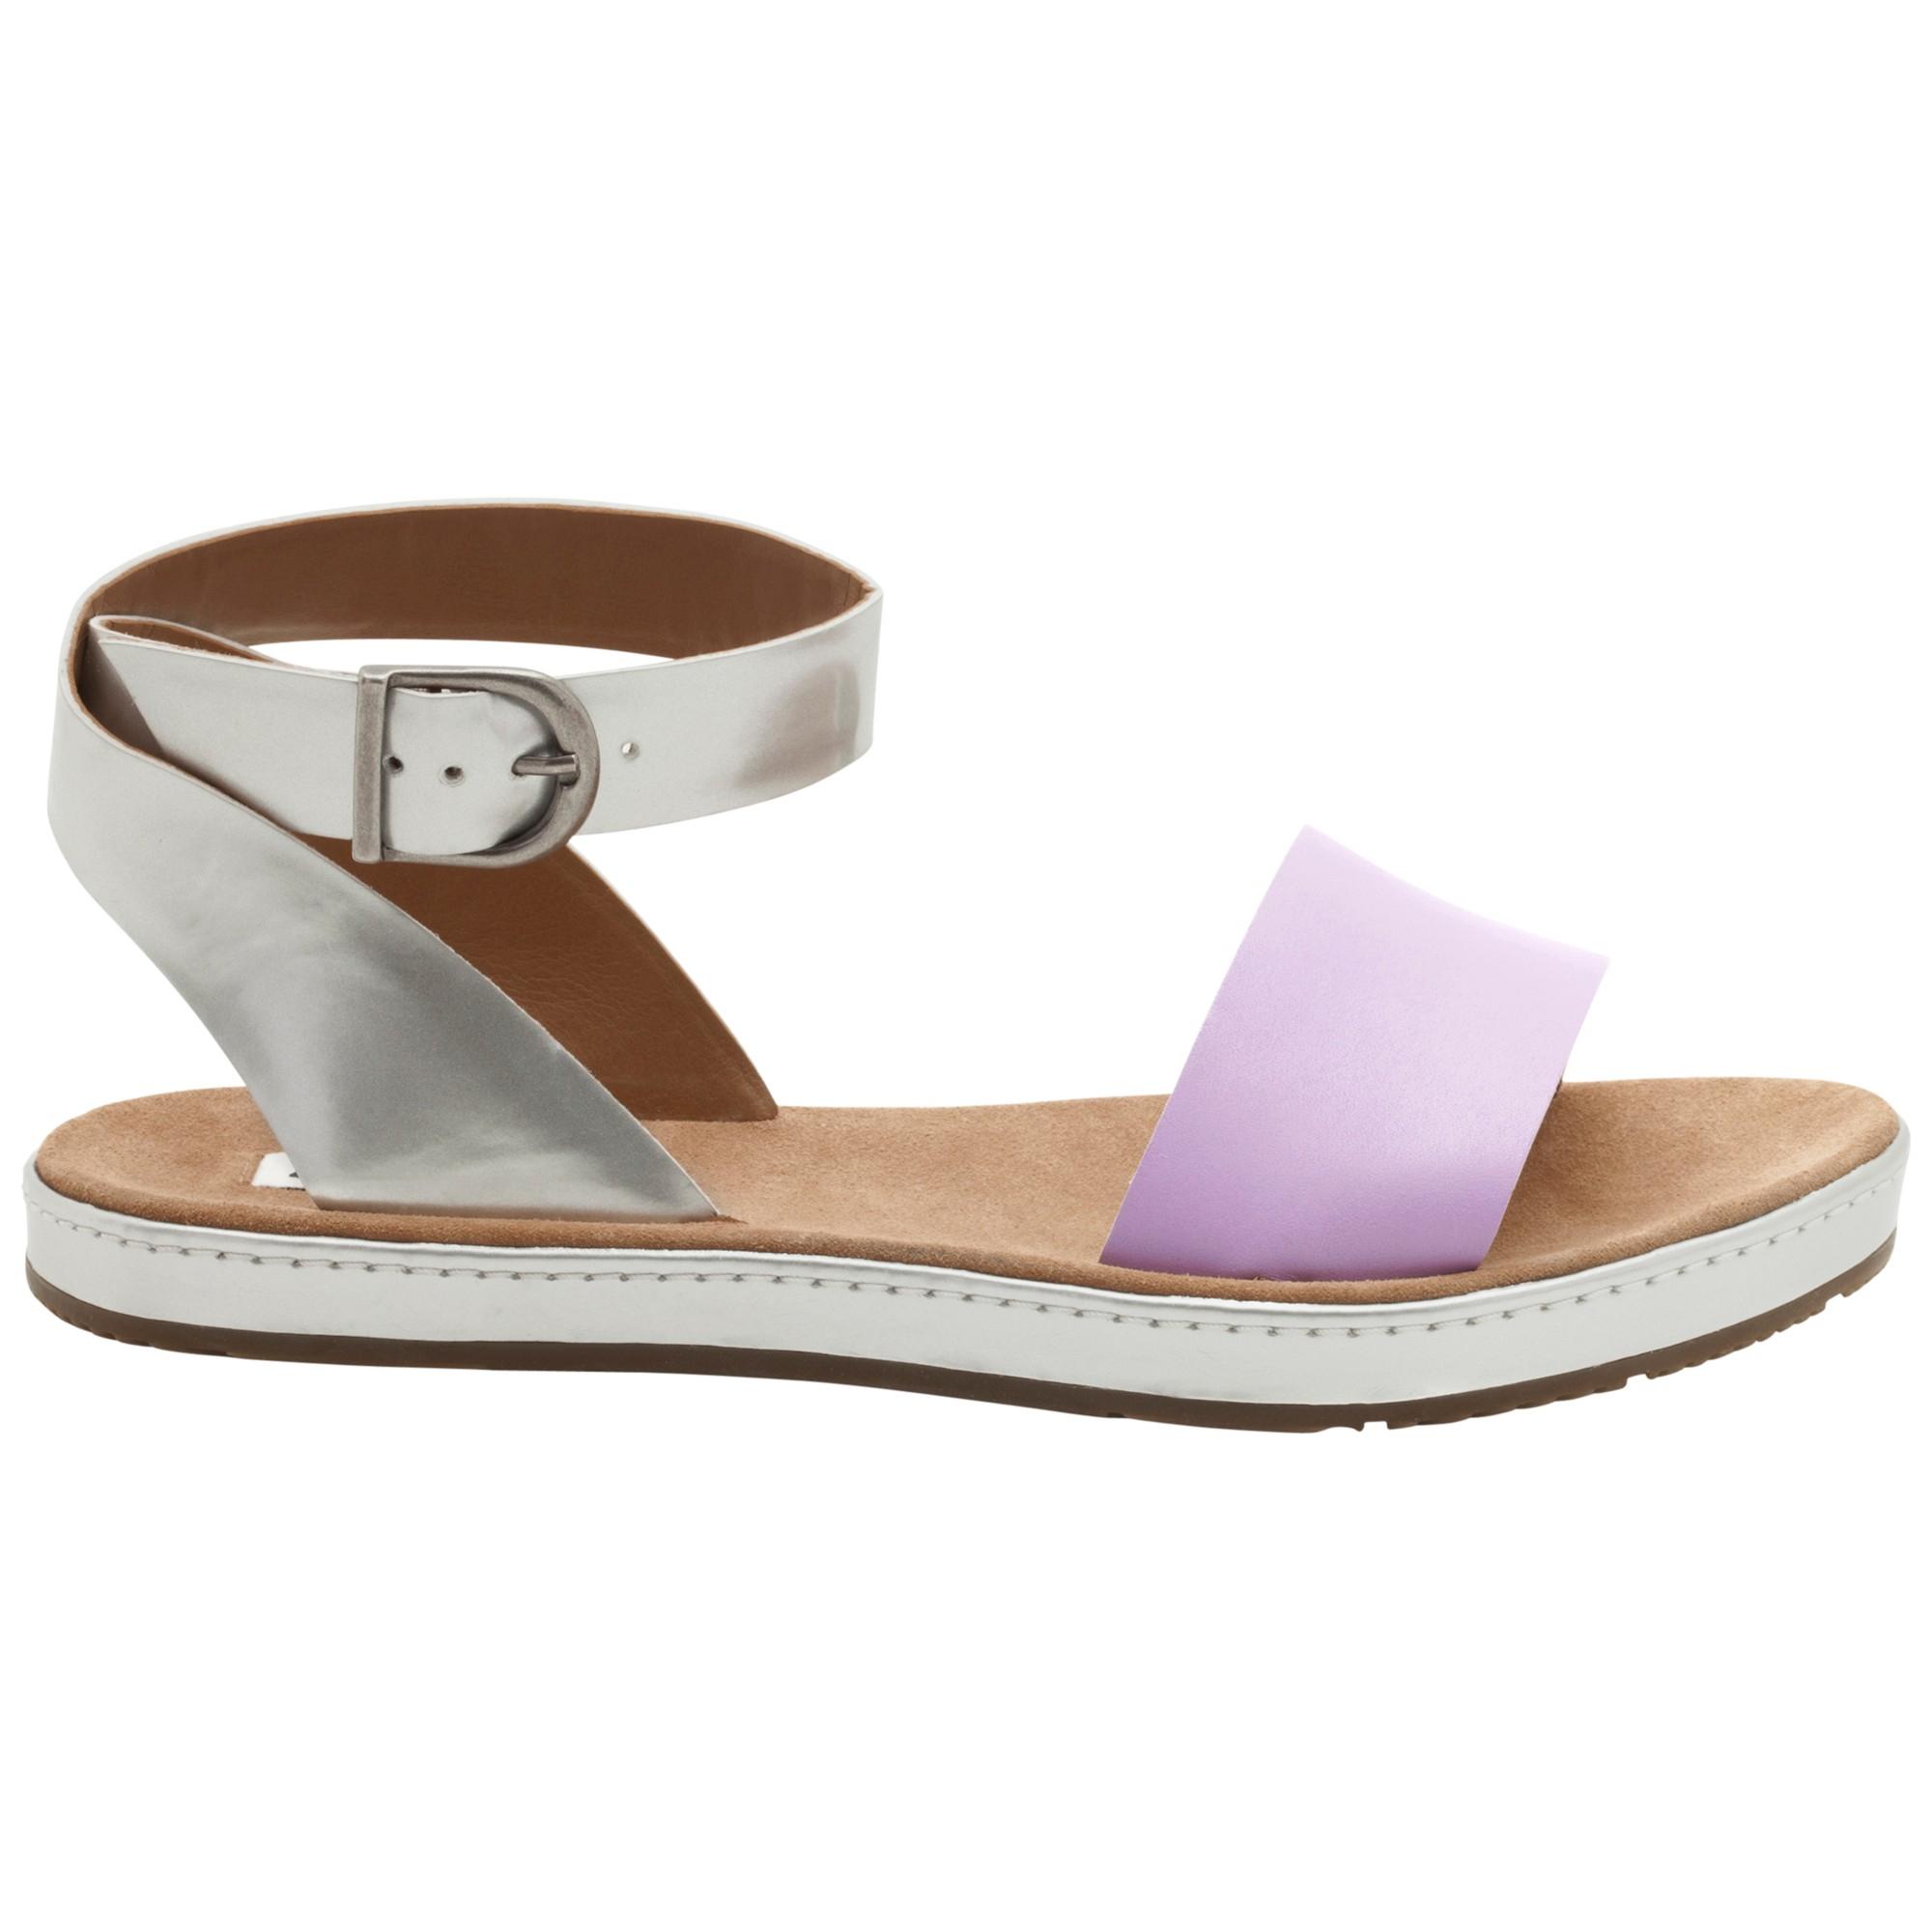 f0429ed4c2cba Clarks Romantic Moon Leather Flat Sandals in Purple - Lyst